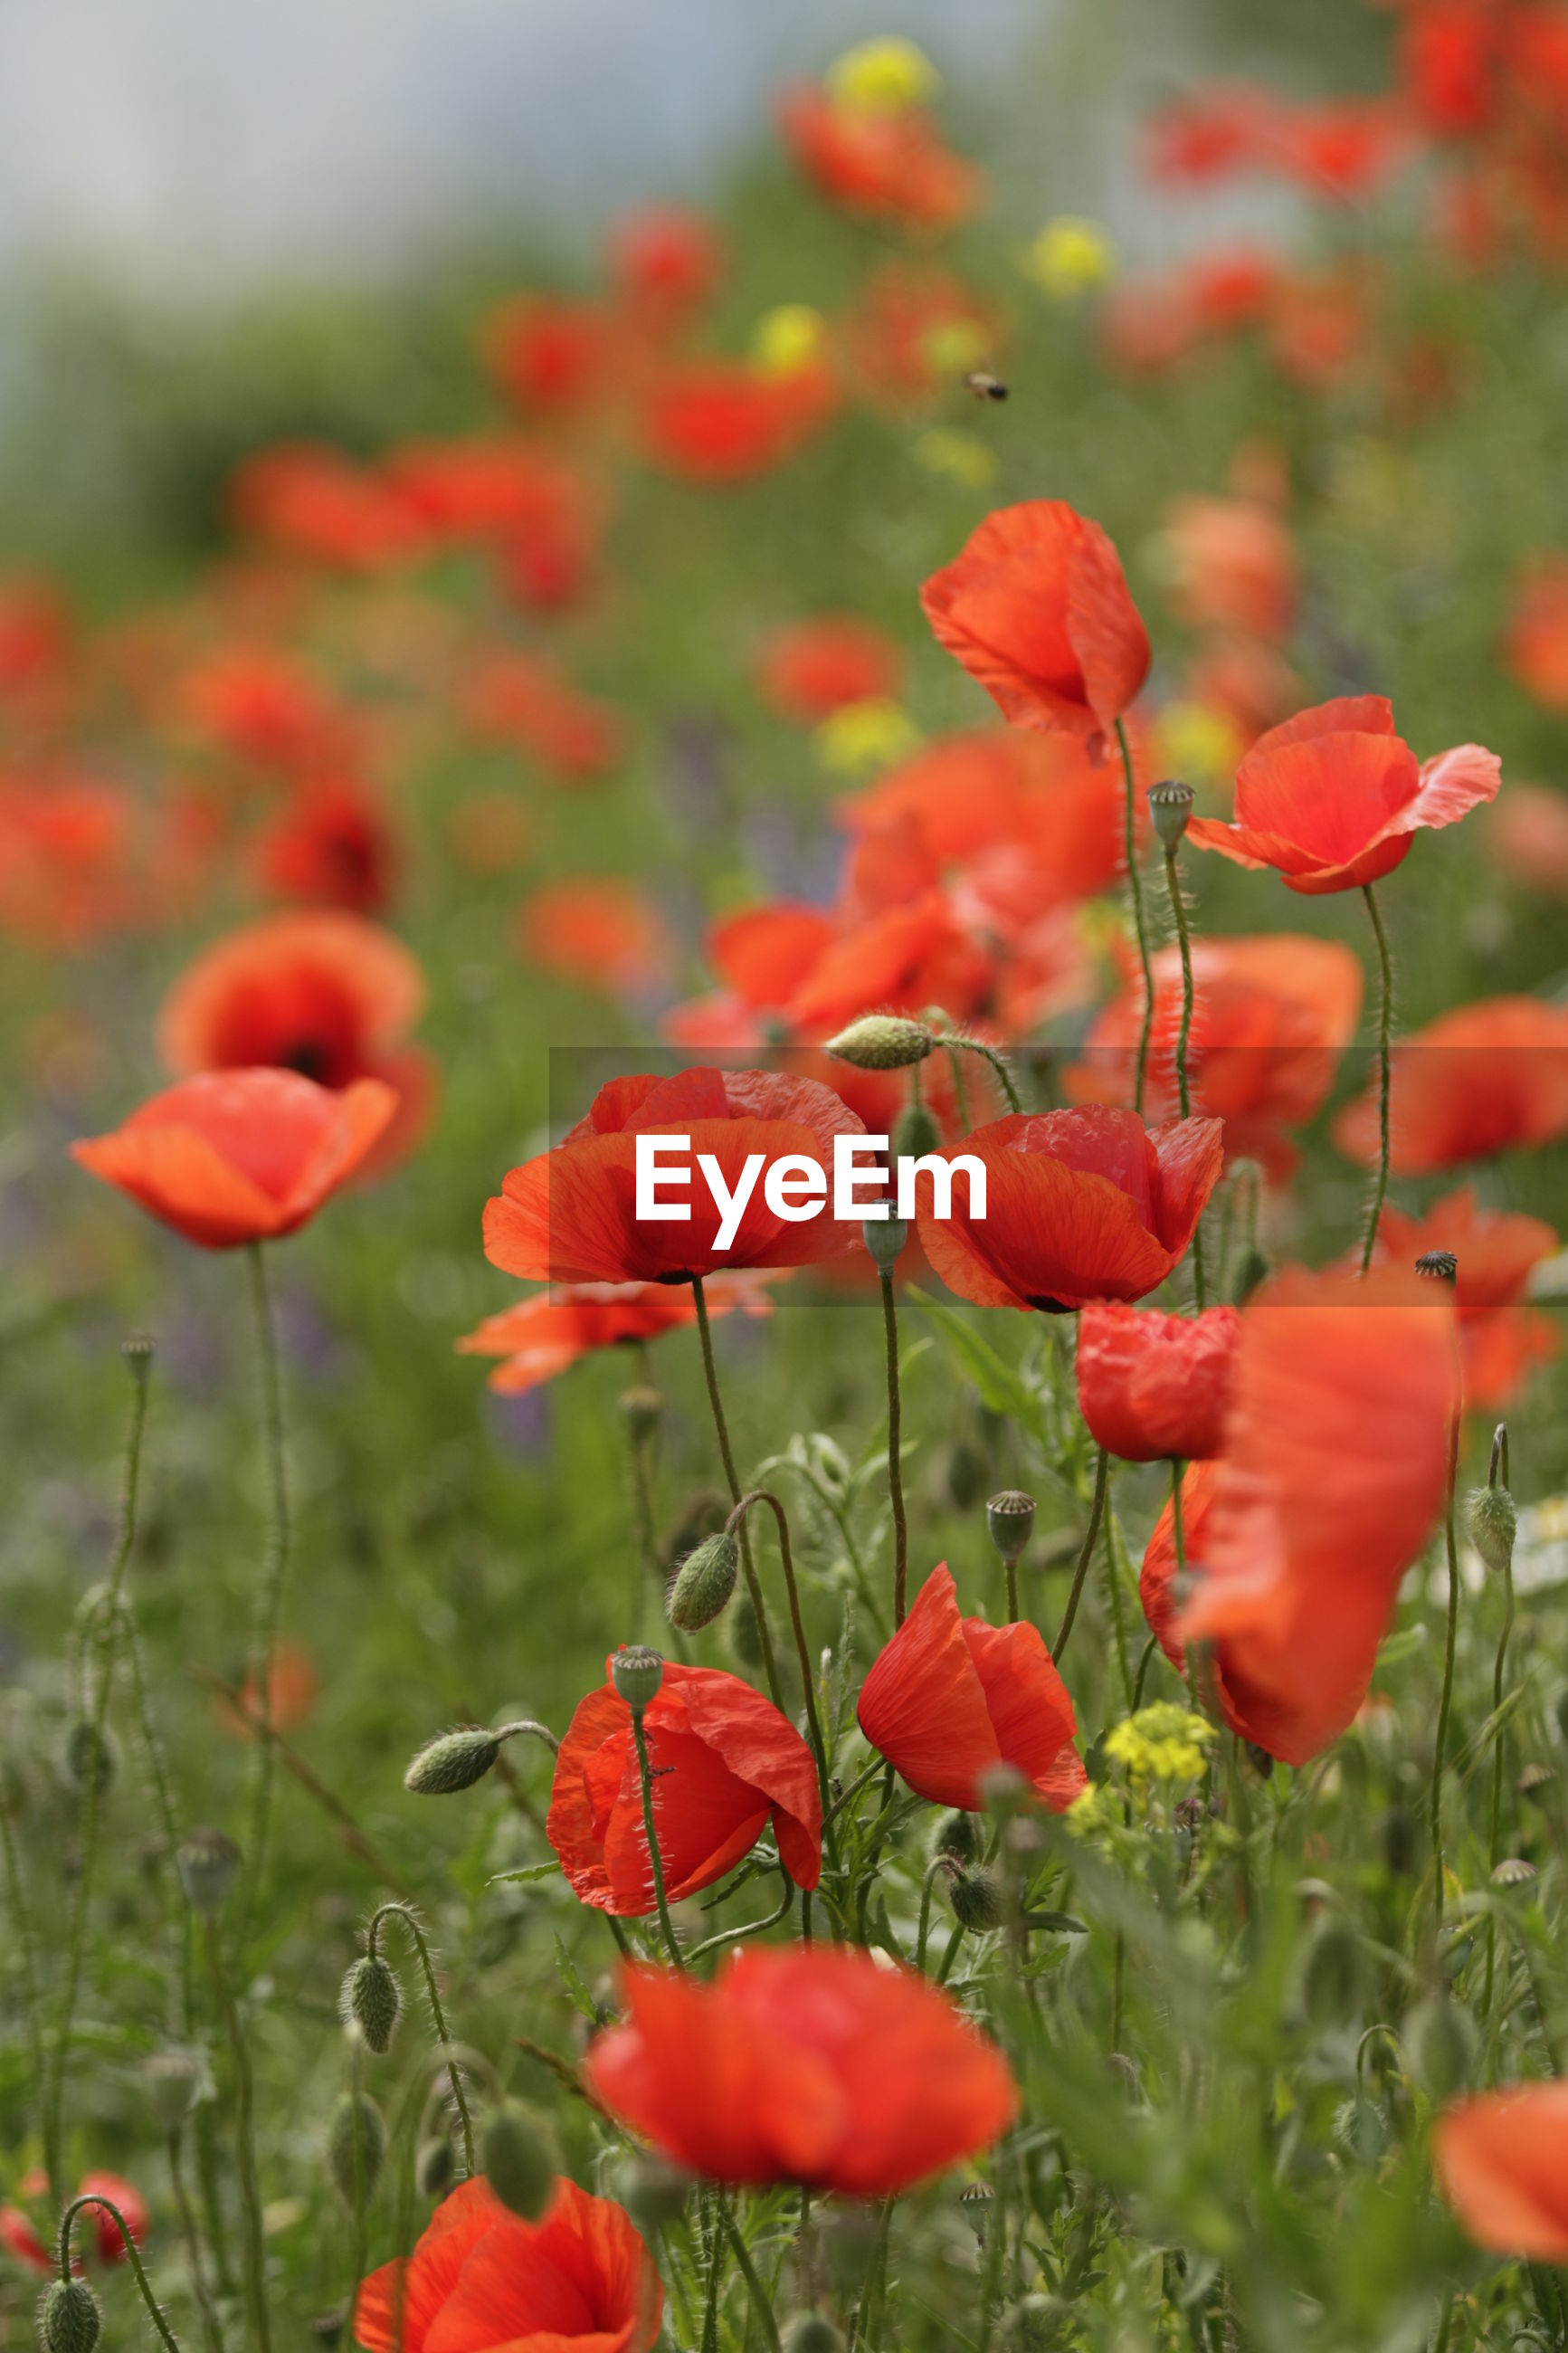 RED POPPY FLOWERS BLOOMING ON FIELD